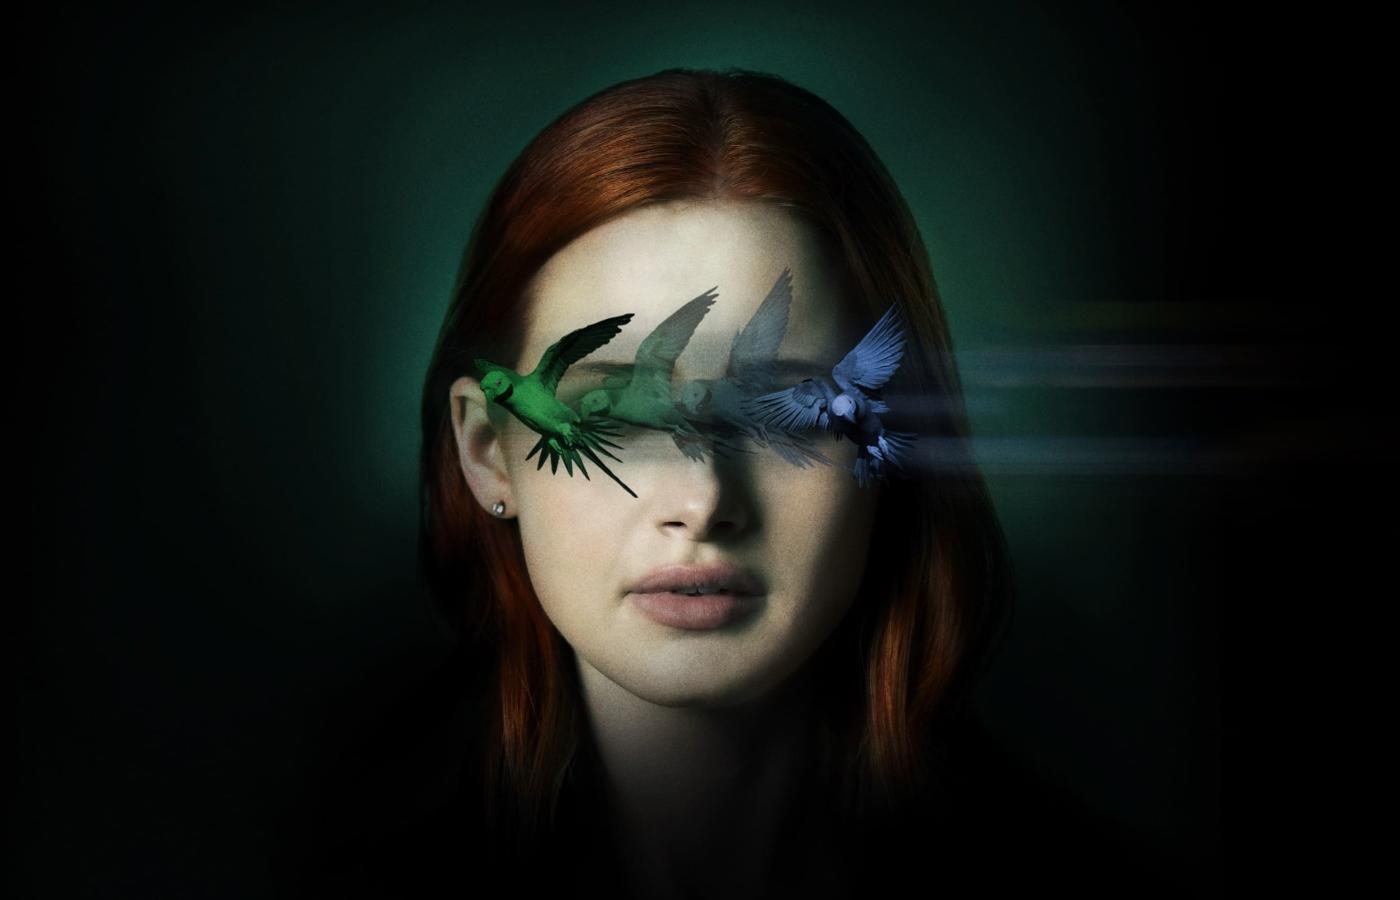 Madelaine Petsch Sightless Movie Wallpaper in 1400x900 Resolution